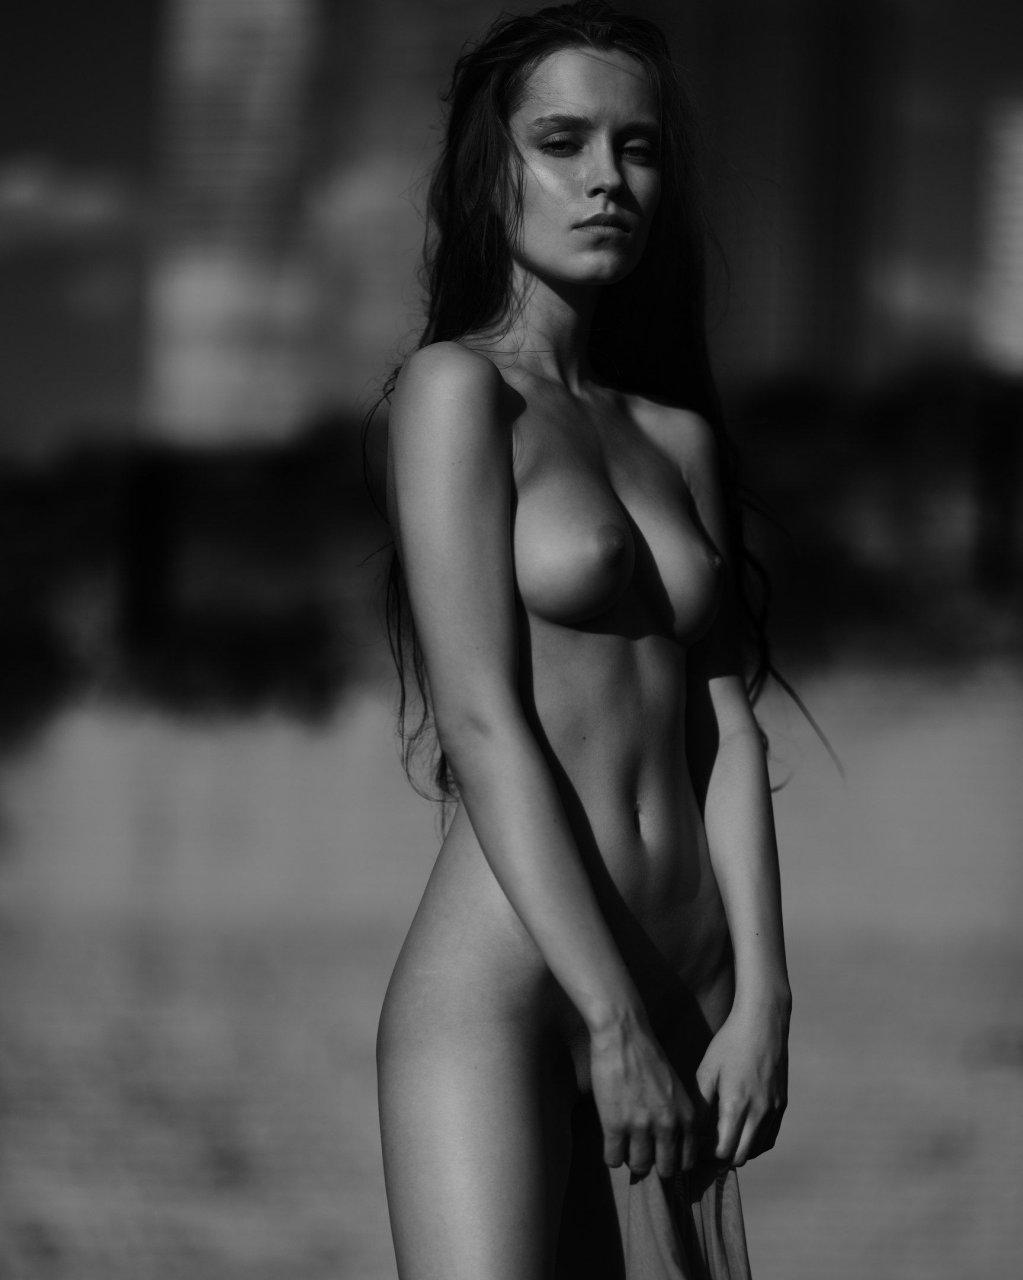 Fenix Raya Nude Photos and Videos nudes (54 photo)